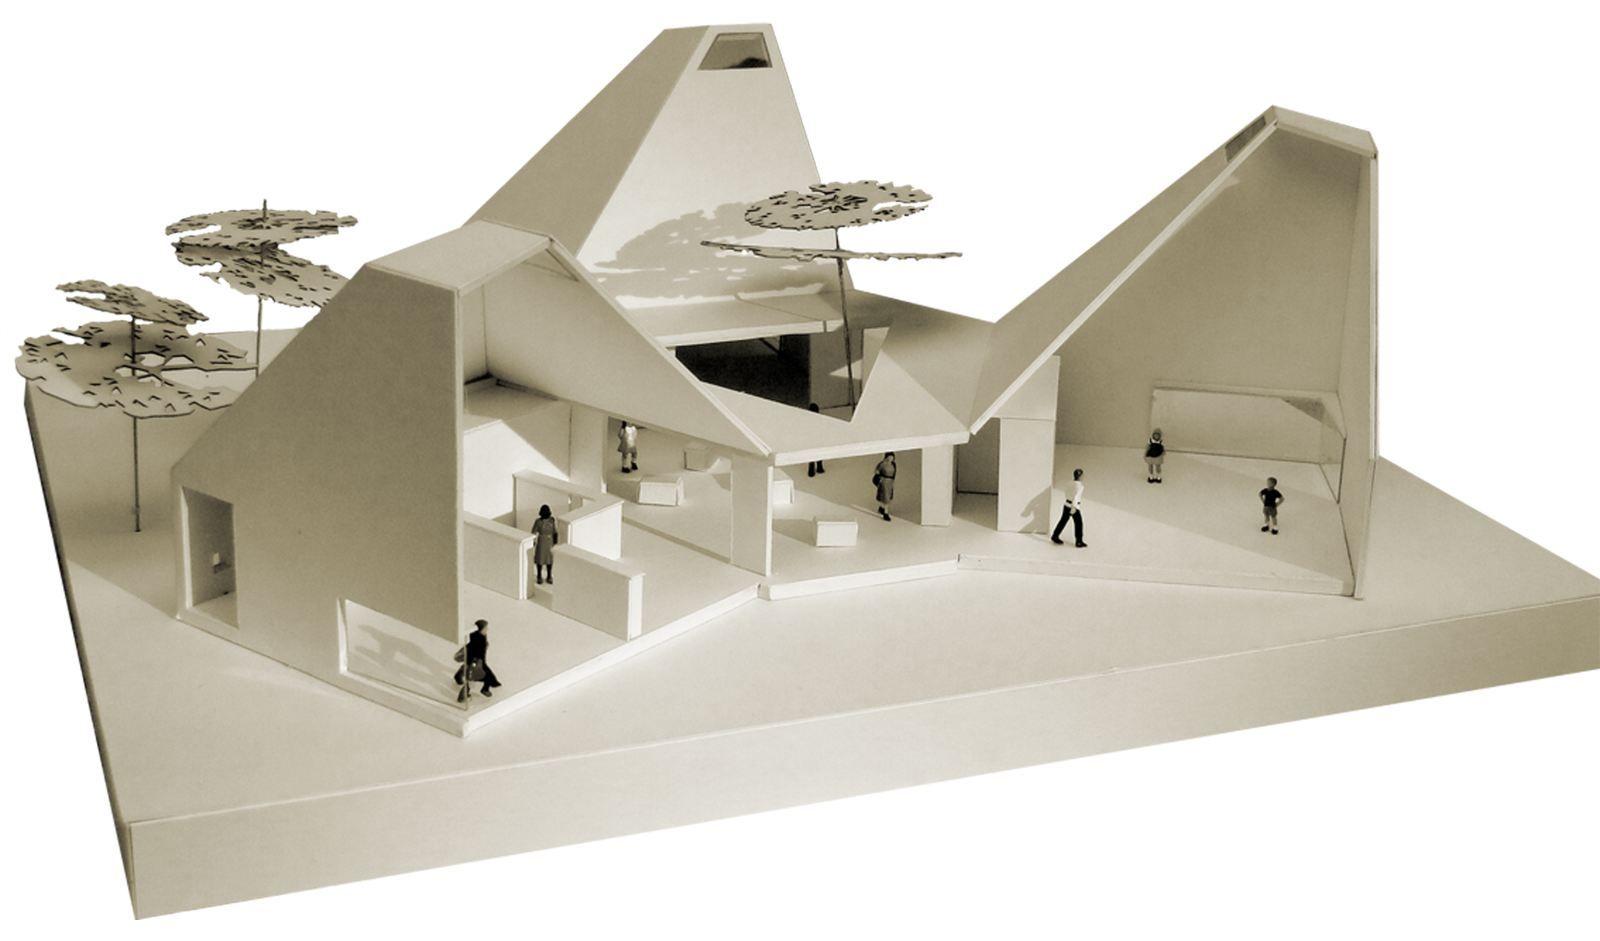 Giancarlo mazzanti jard n social en santa marta colombia for Revistas arquitectura espana